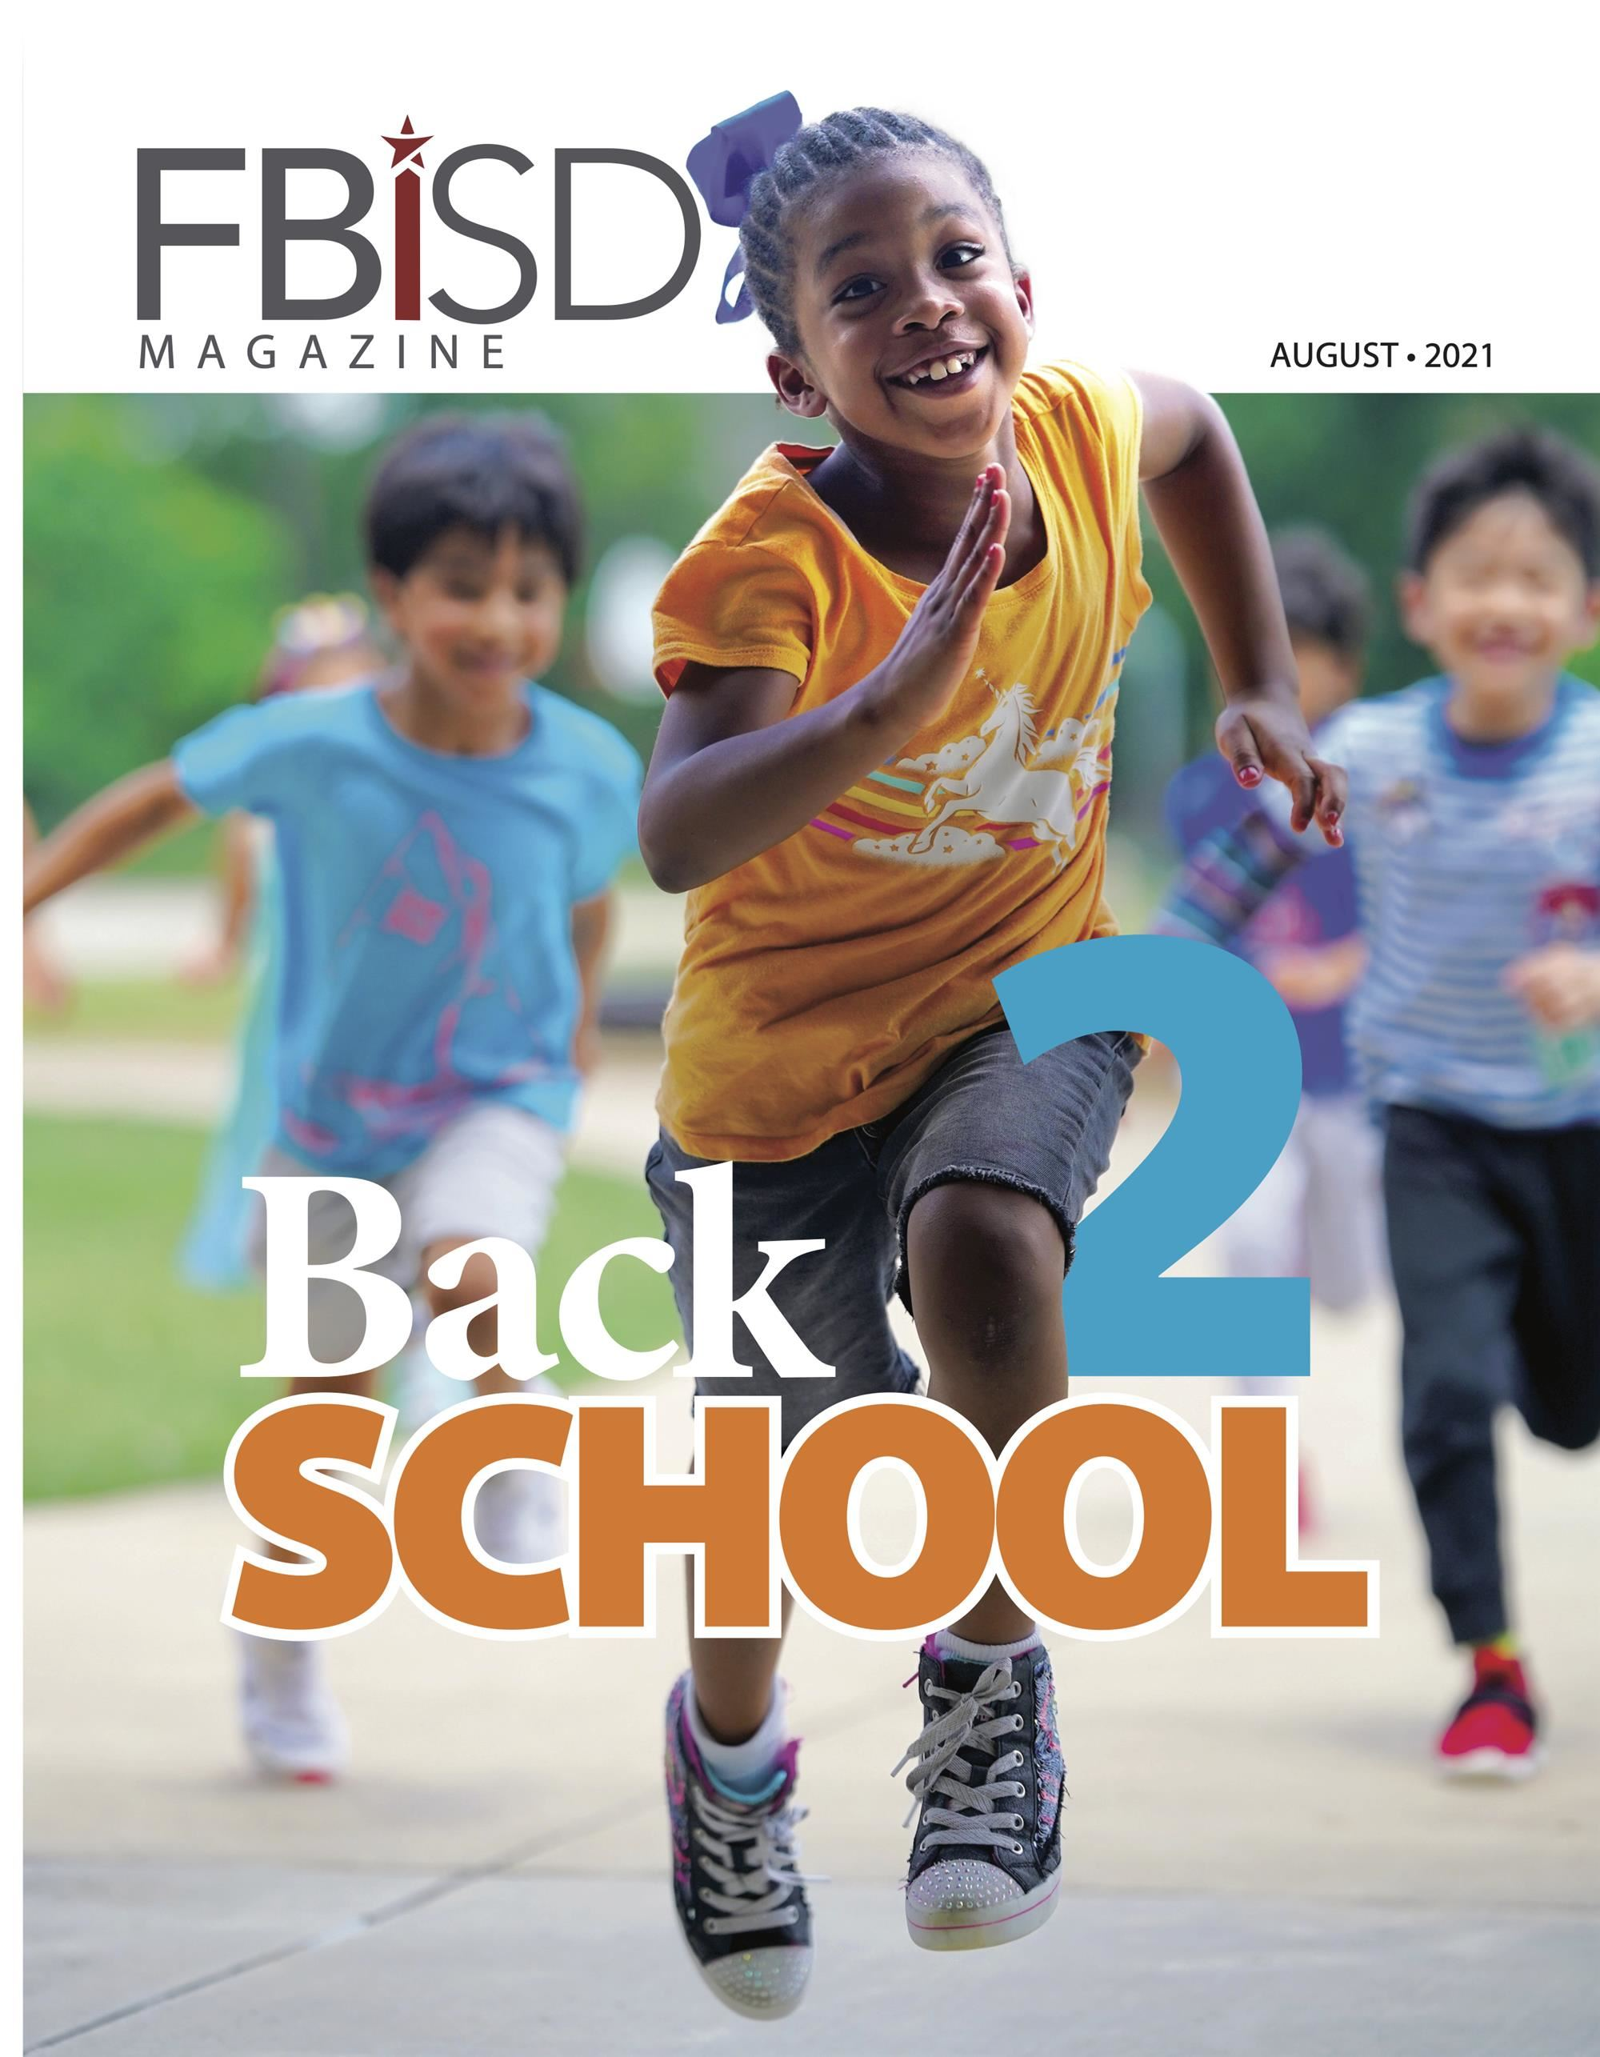 FBISD Magazine Summer 2019